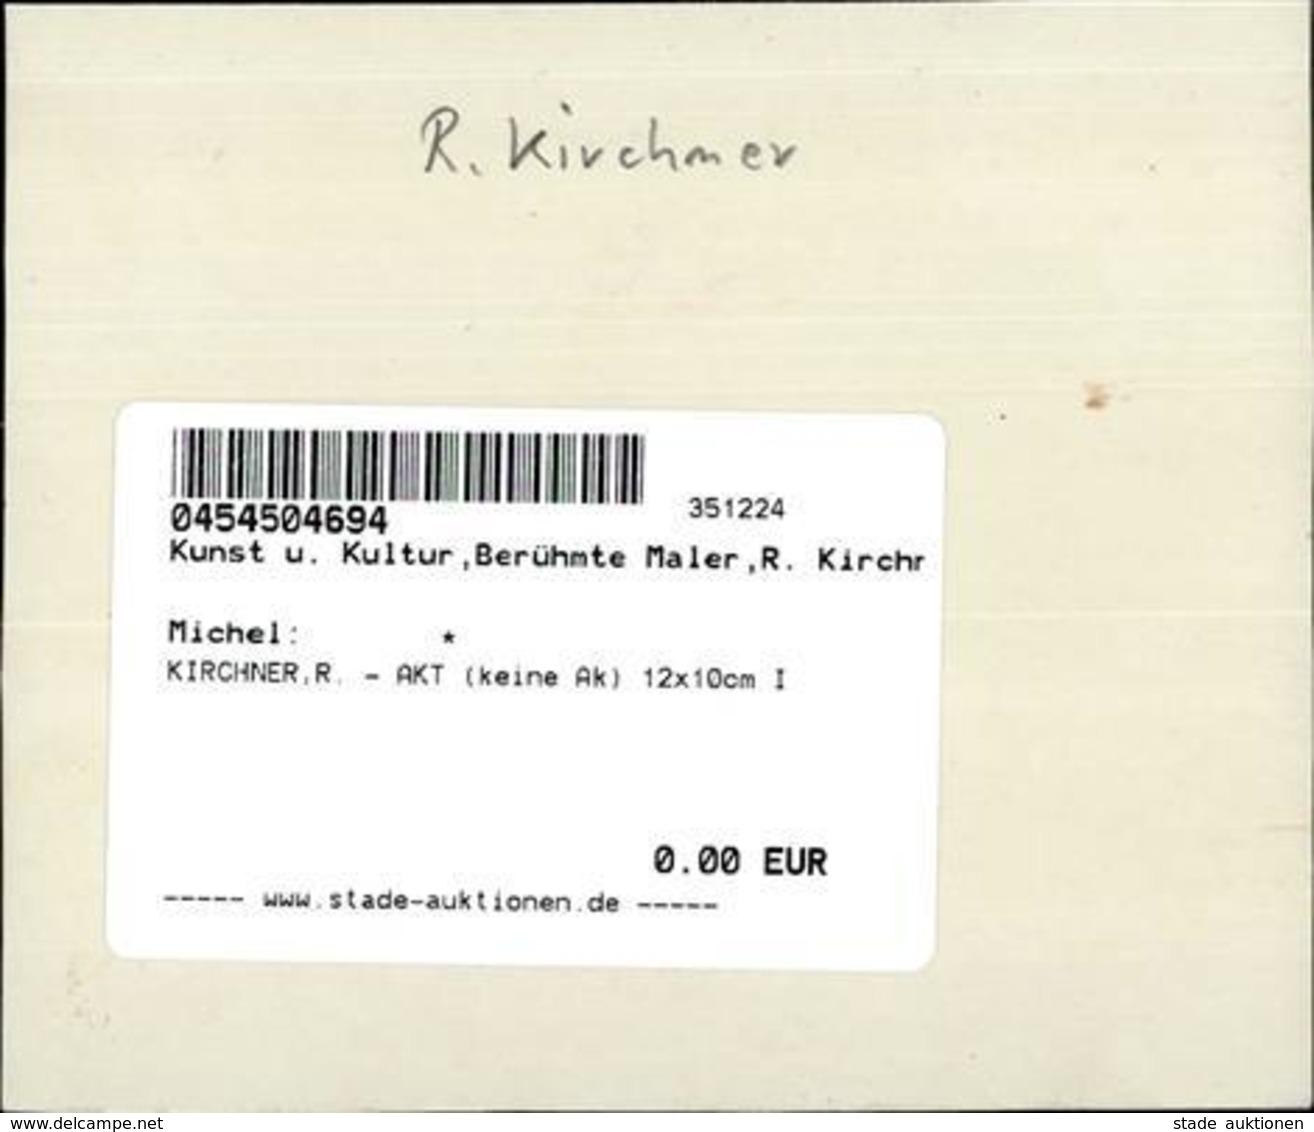 KIRCHNER,R. - AKT (keine Ak) 12x10cm I - Kirchner, Raphael